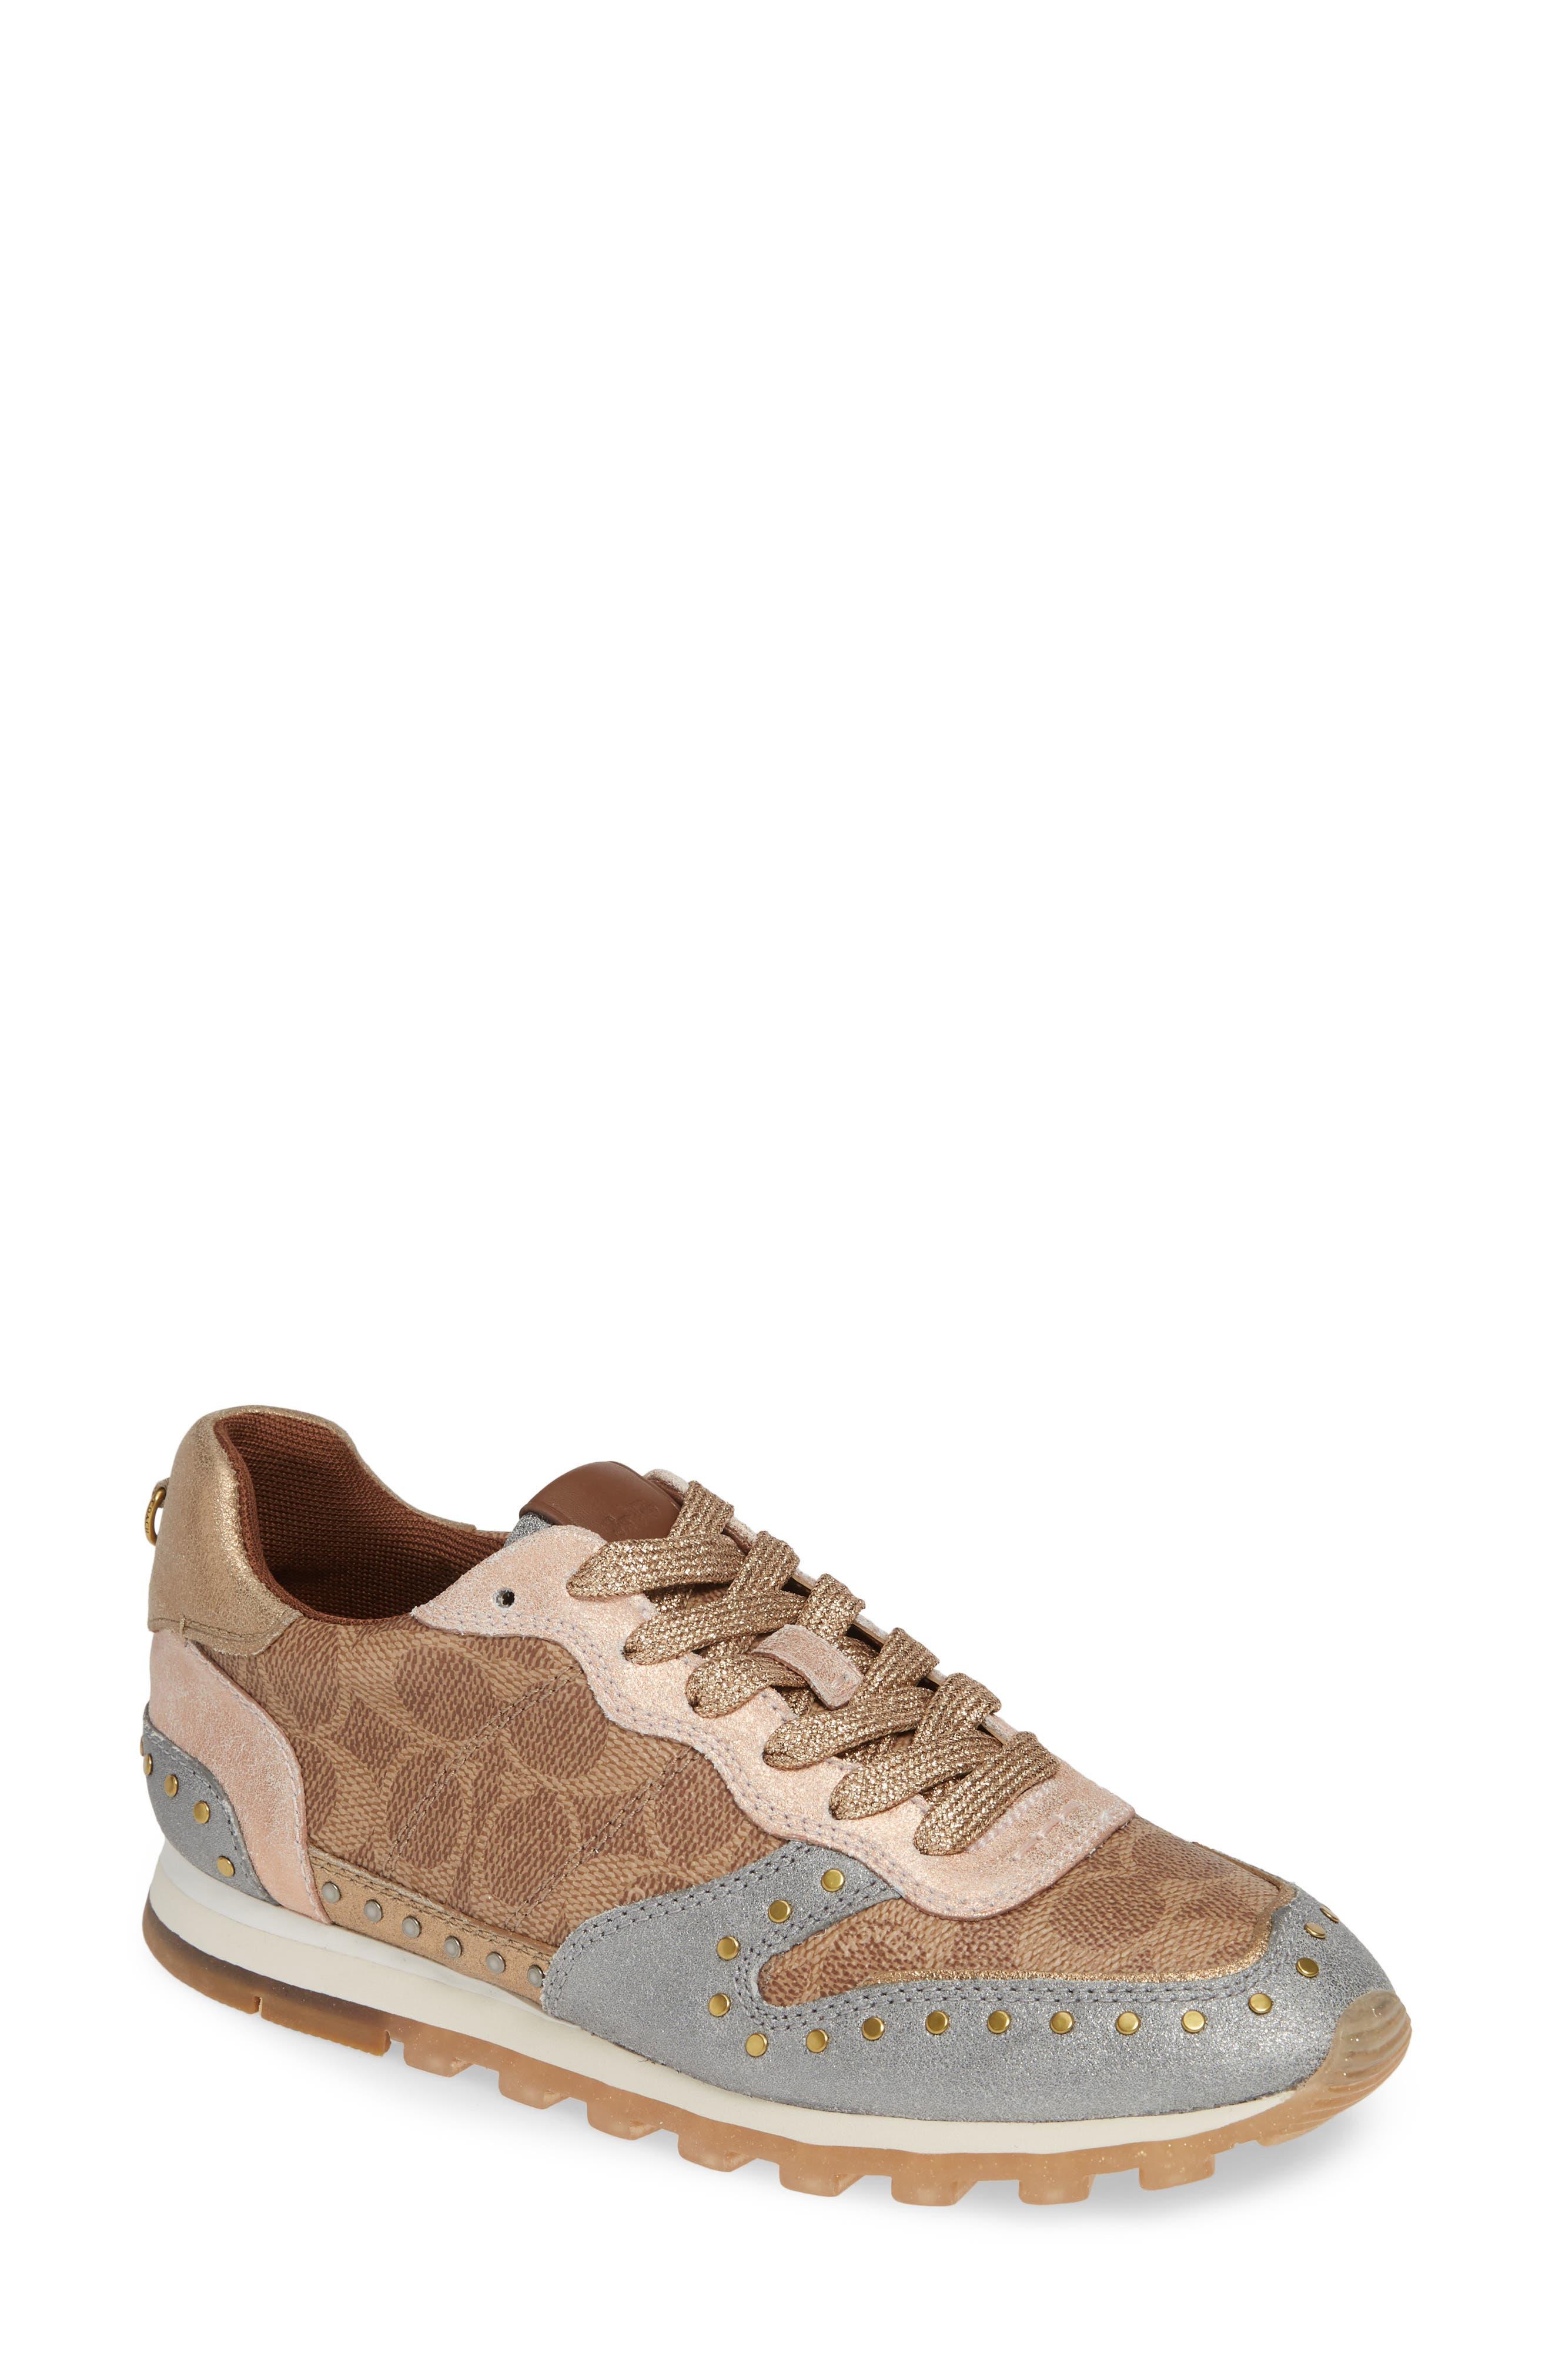 COACH, C118 Studded Sneaker, Main thumbnail 1, color, TAN/ GOLD MULTI